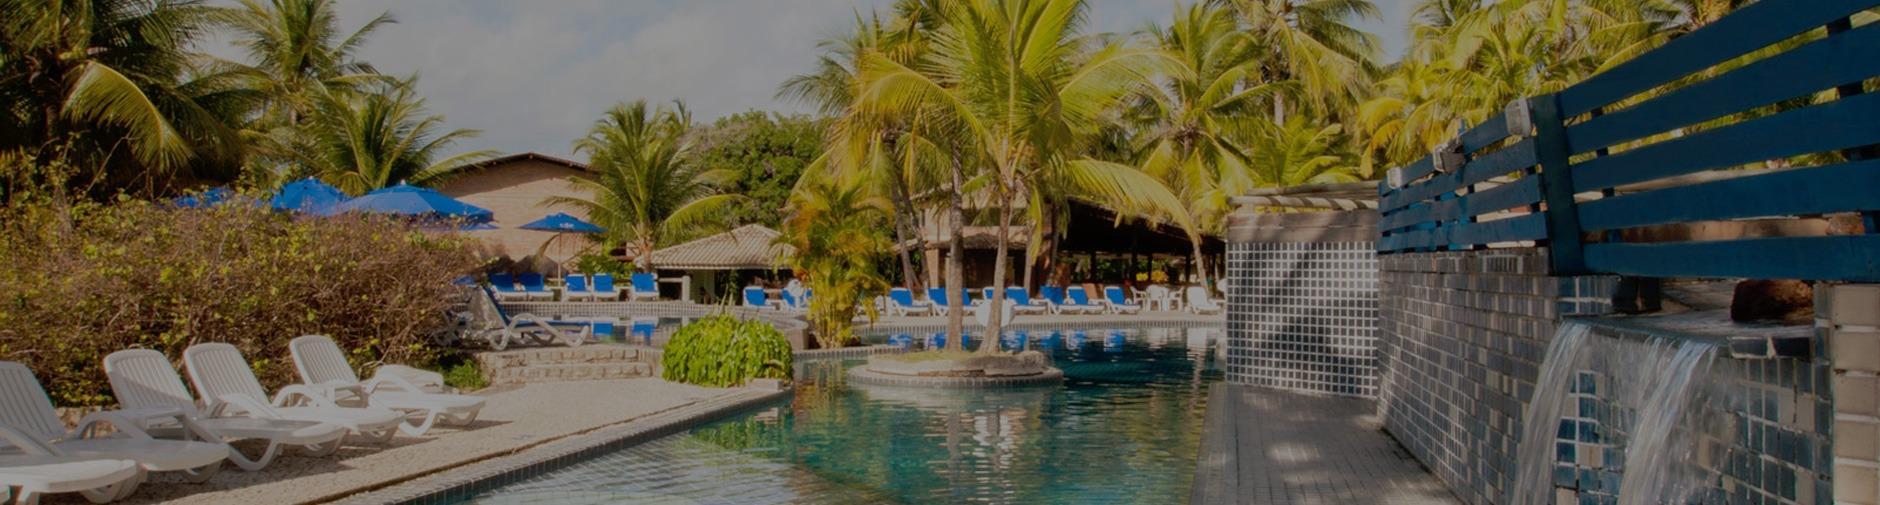 pacotes pratagy beach resort